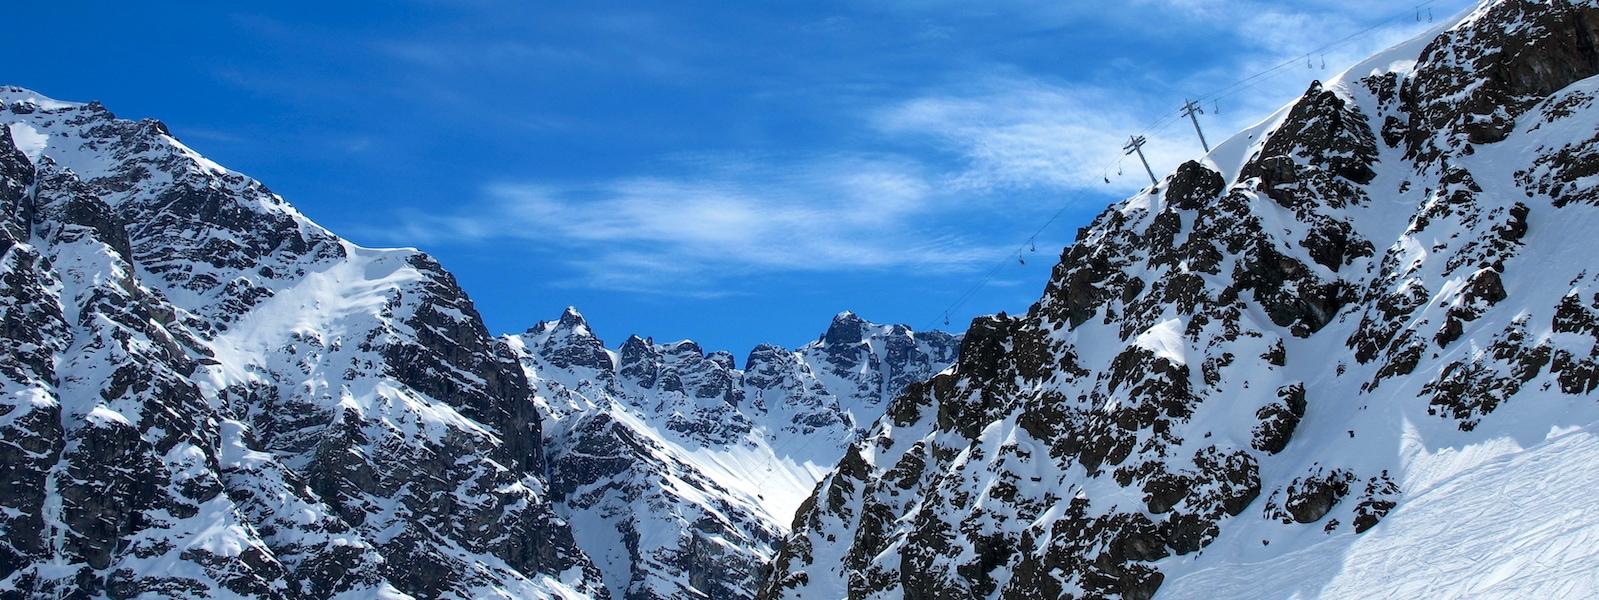 Chile ski resorts